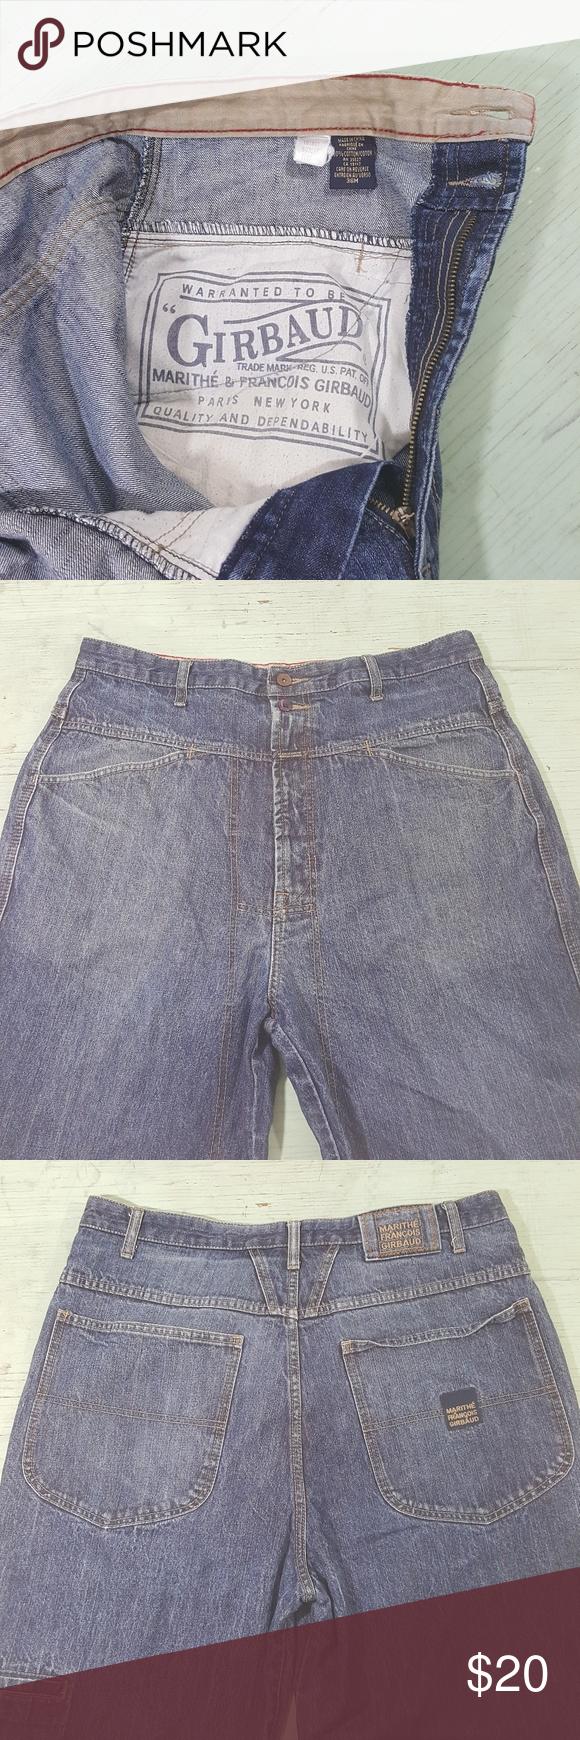 Vintage Girbaud Marithe & Francois jeans Girbaud jeans